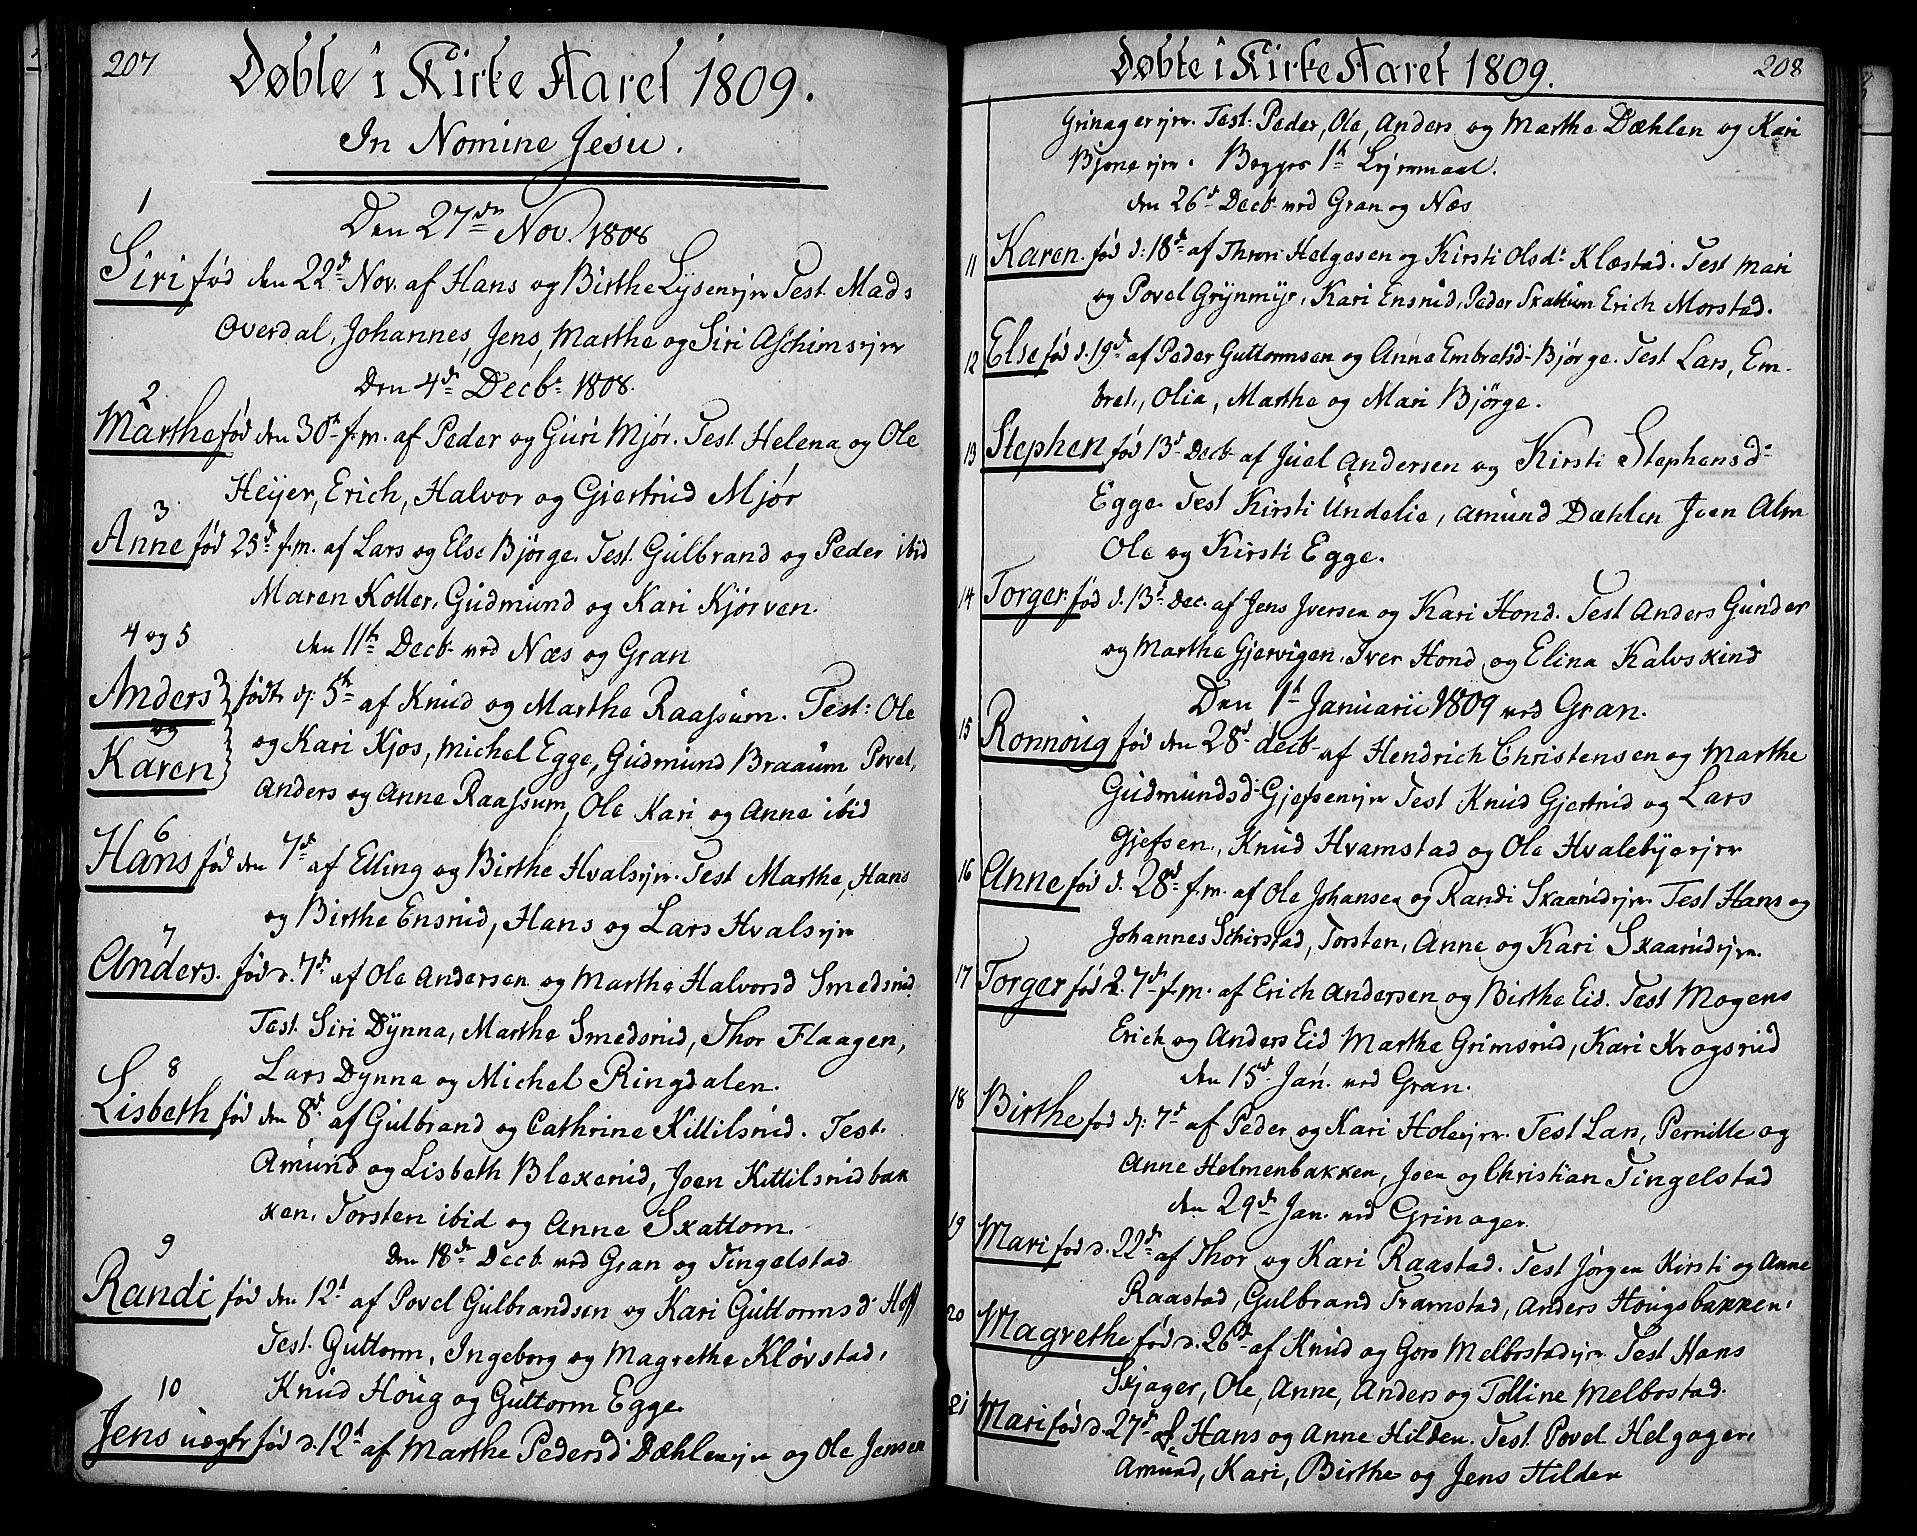 SAH, Gran prestekontor, Ministerialbok nr. 8, 1798-1811, s. 207-208